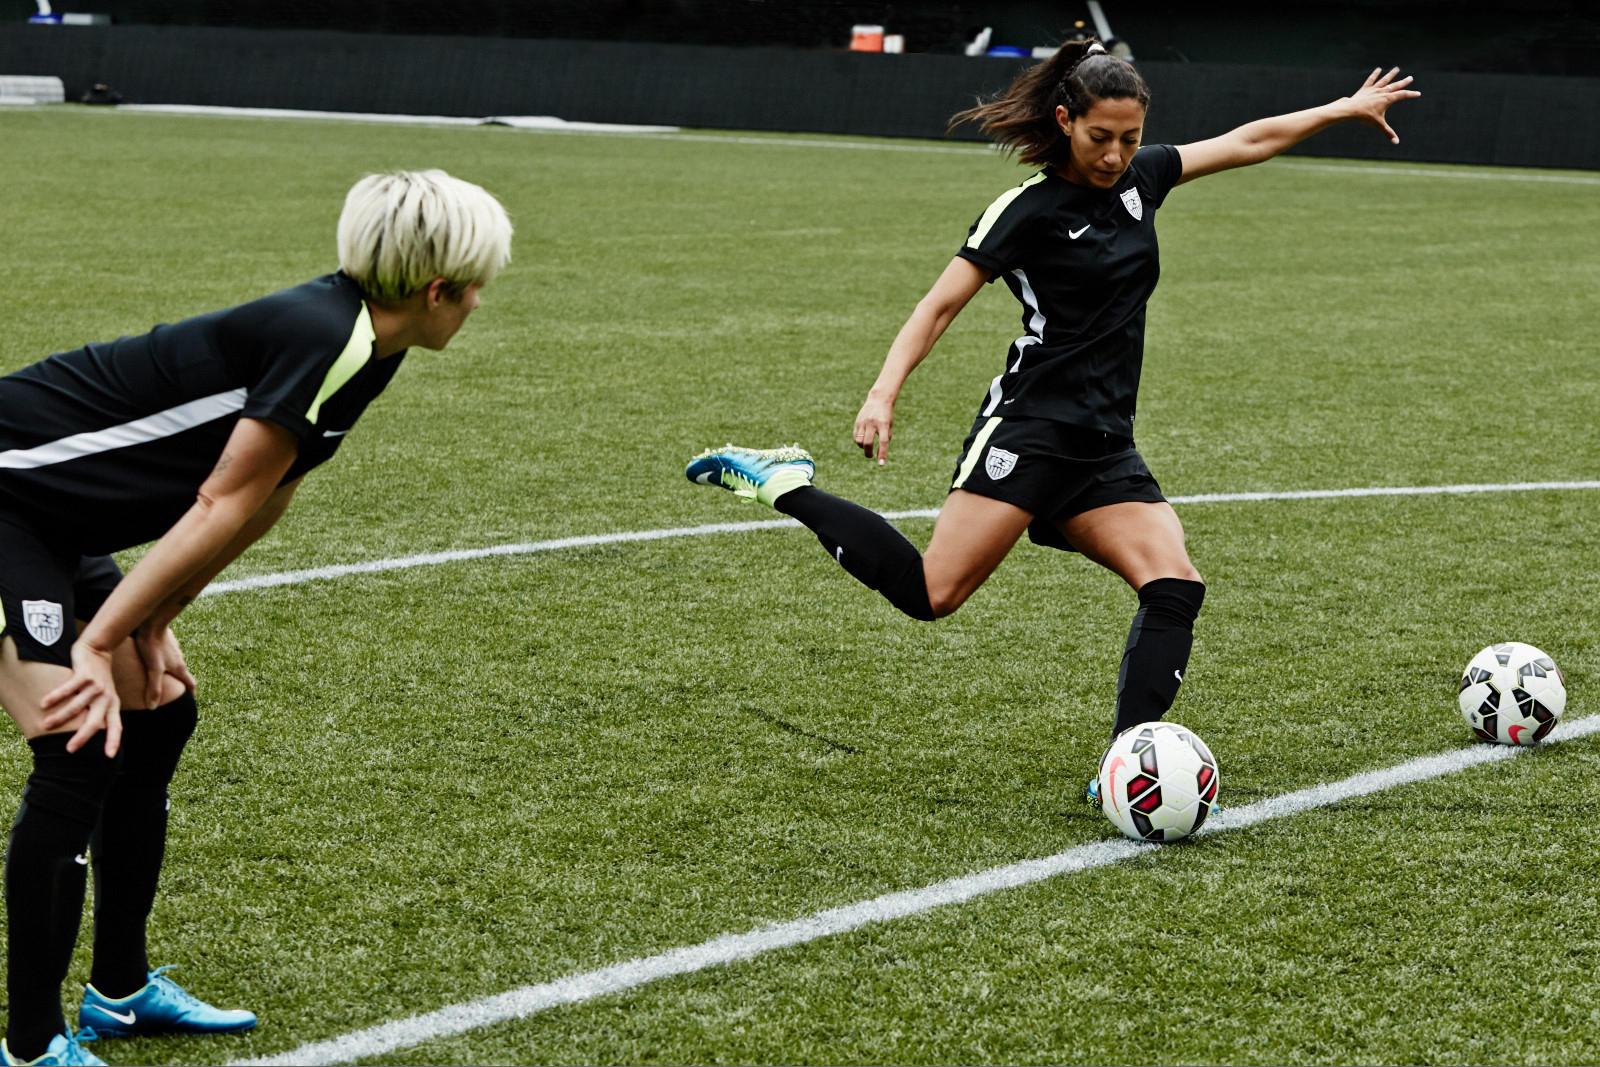 Woman's National Soccer Team